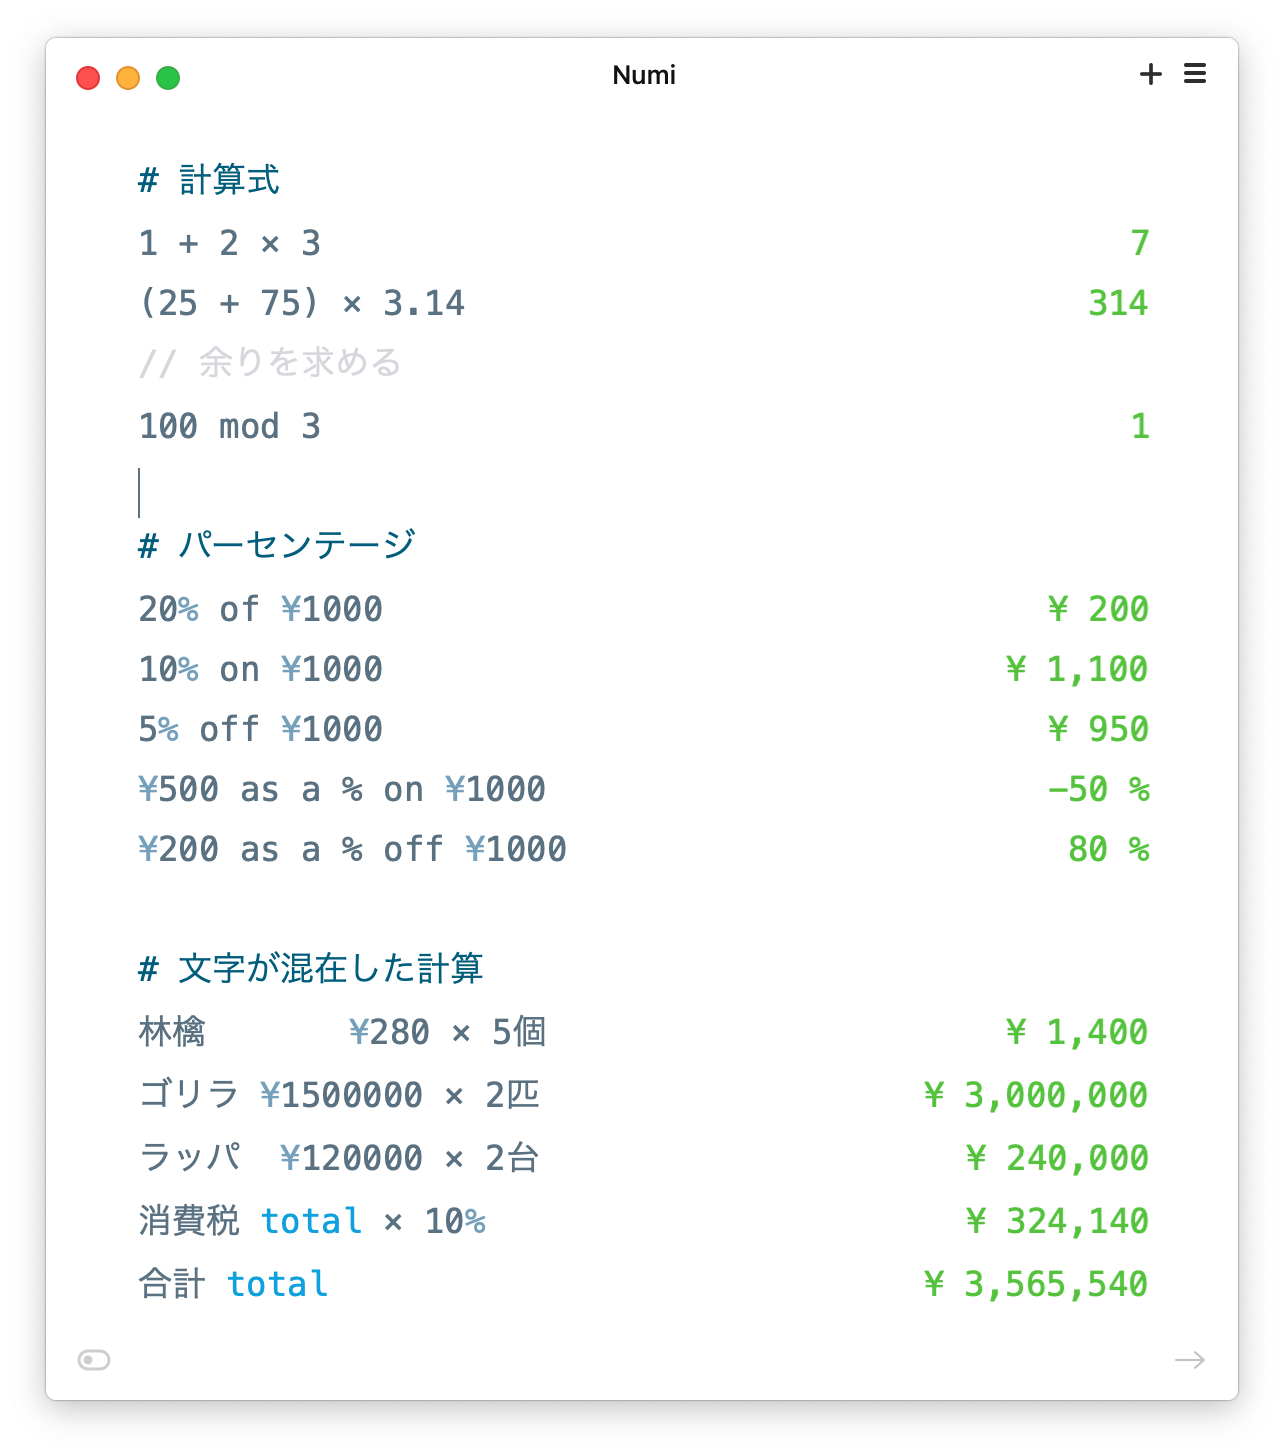 Numi: 日常の電卓以上、Excel未満の計算に便利な美しい計算アプリ(Mac)